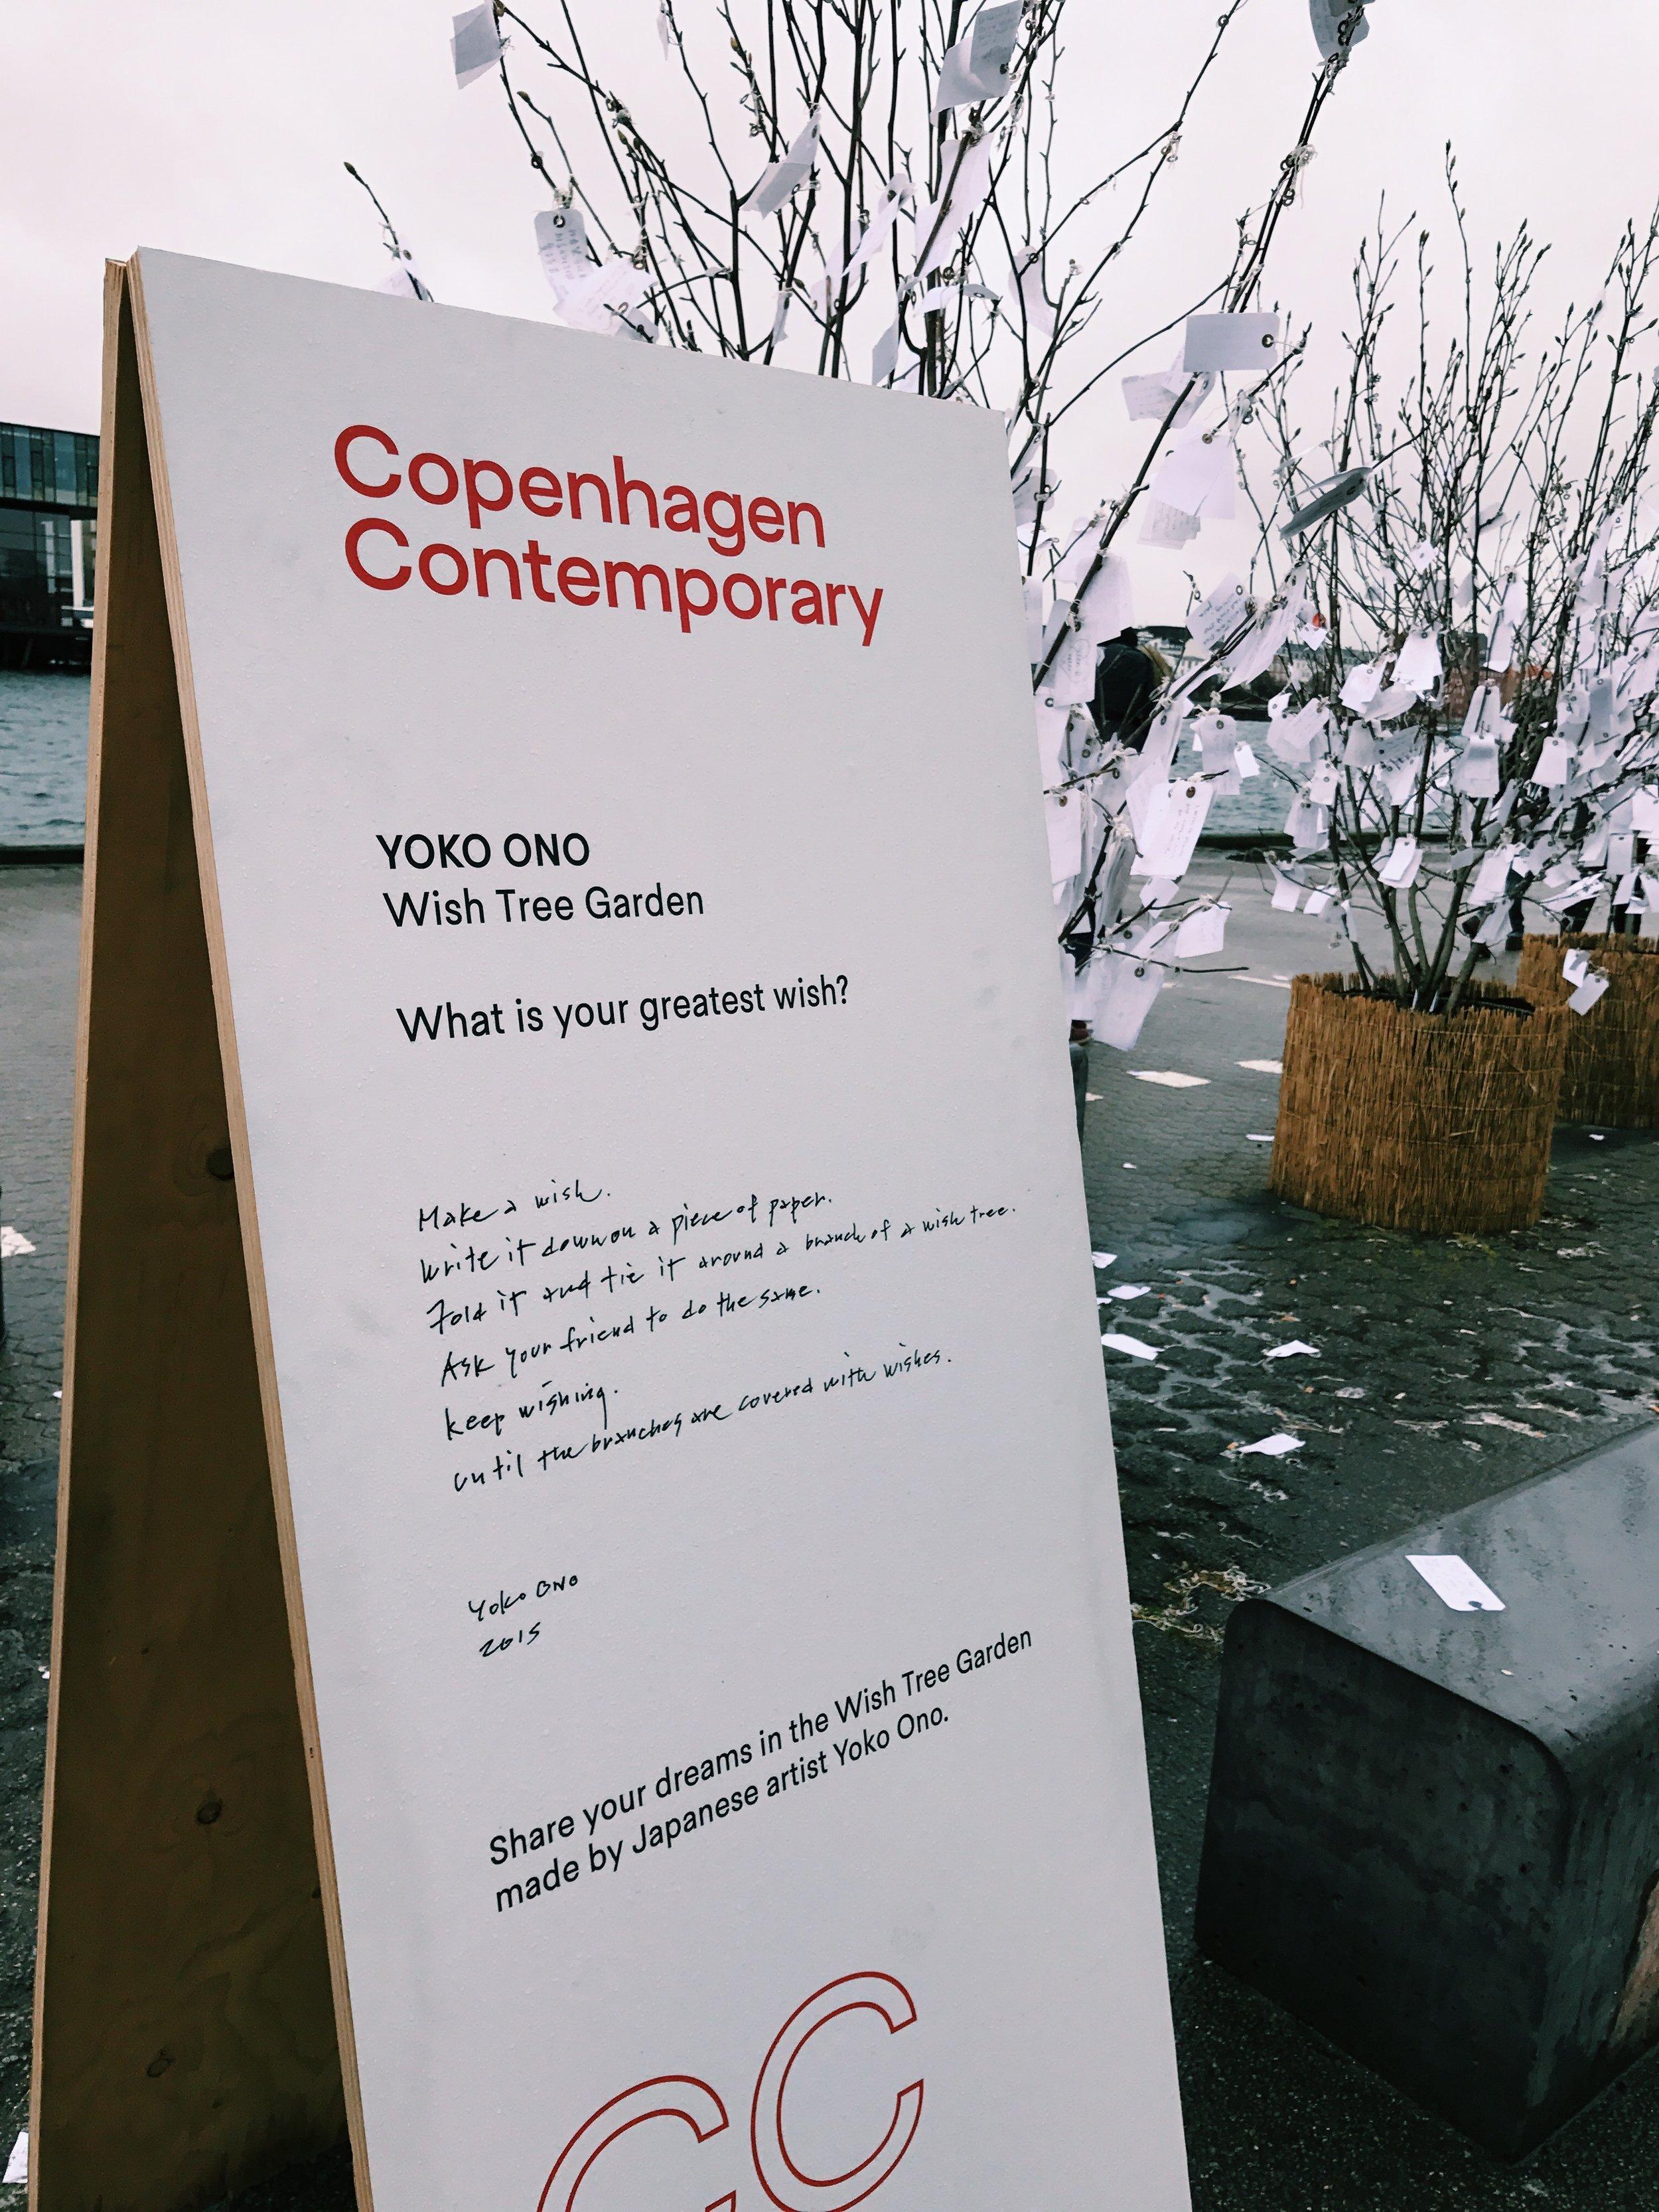 Copenhagen Contemporary.